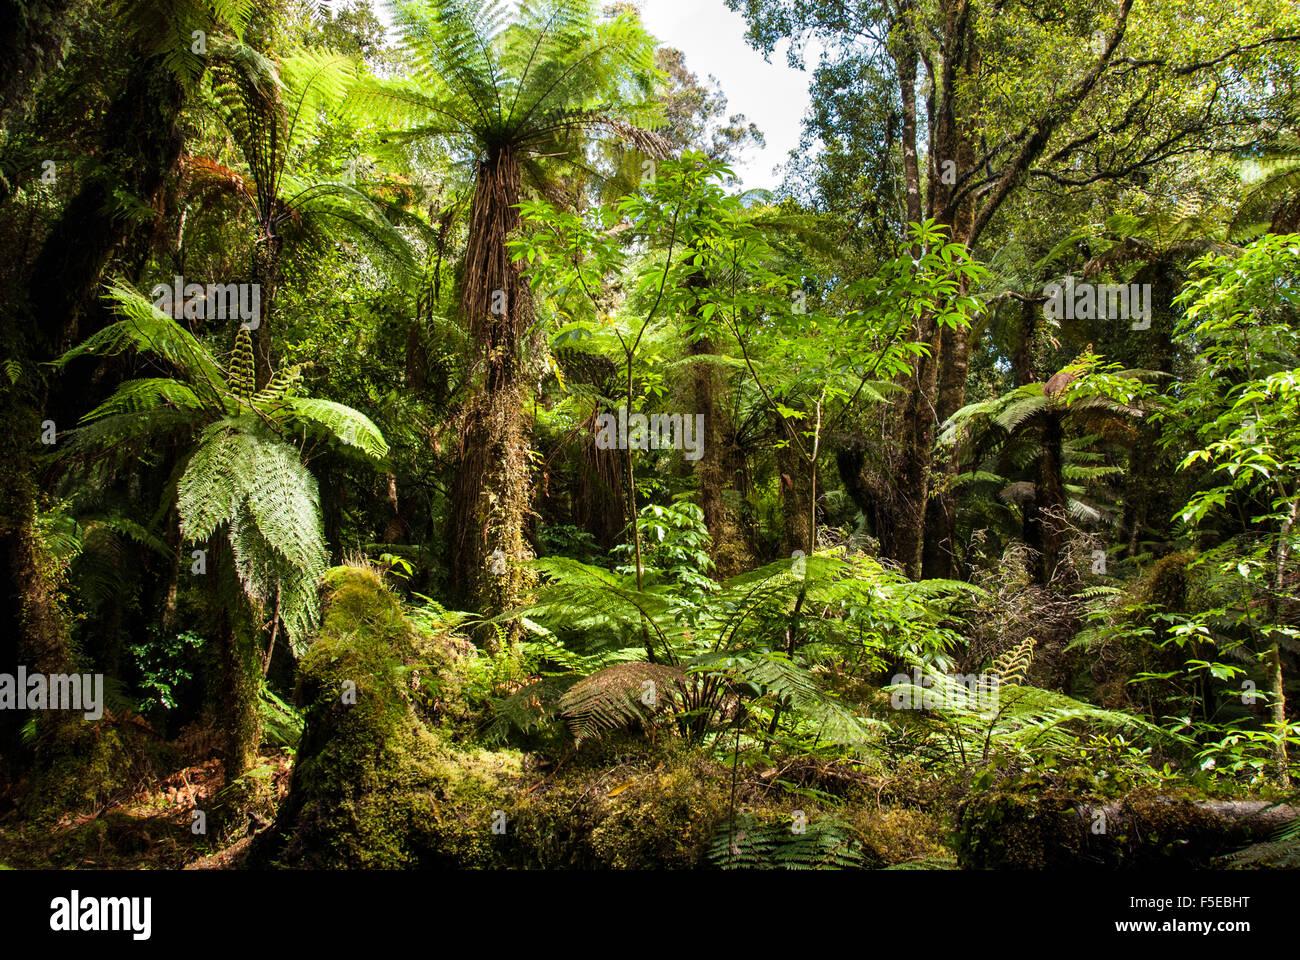 Tree ferns in Glow Worm Dell (Miniehaha), Fox Glacier village, Westland, South Island, New Zealand, Pacific - Stock Image